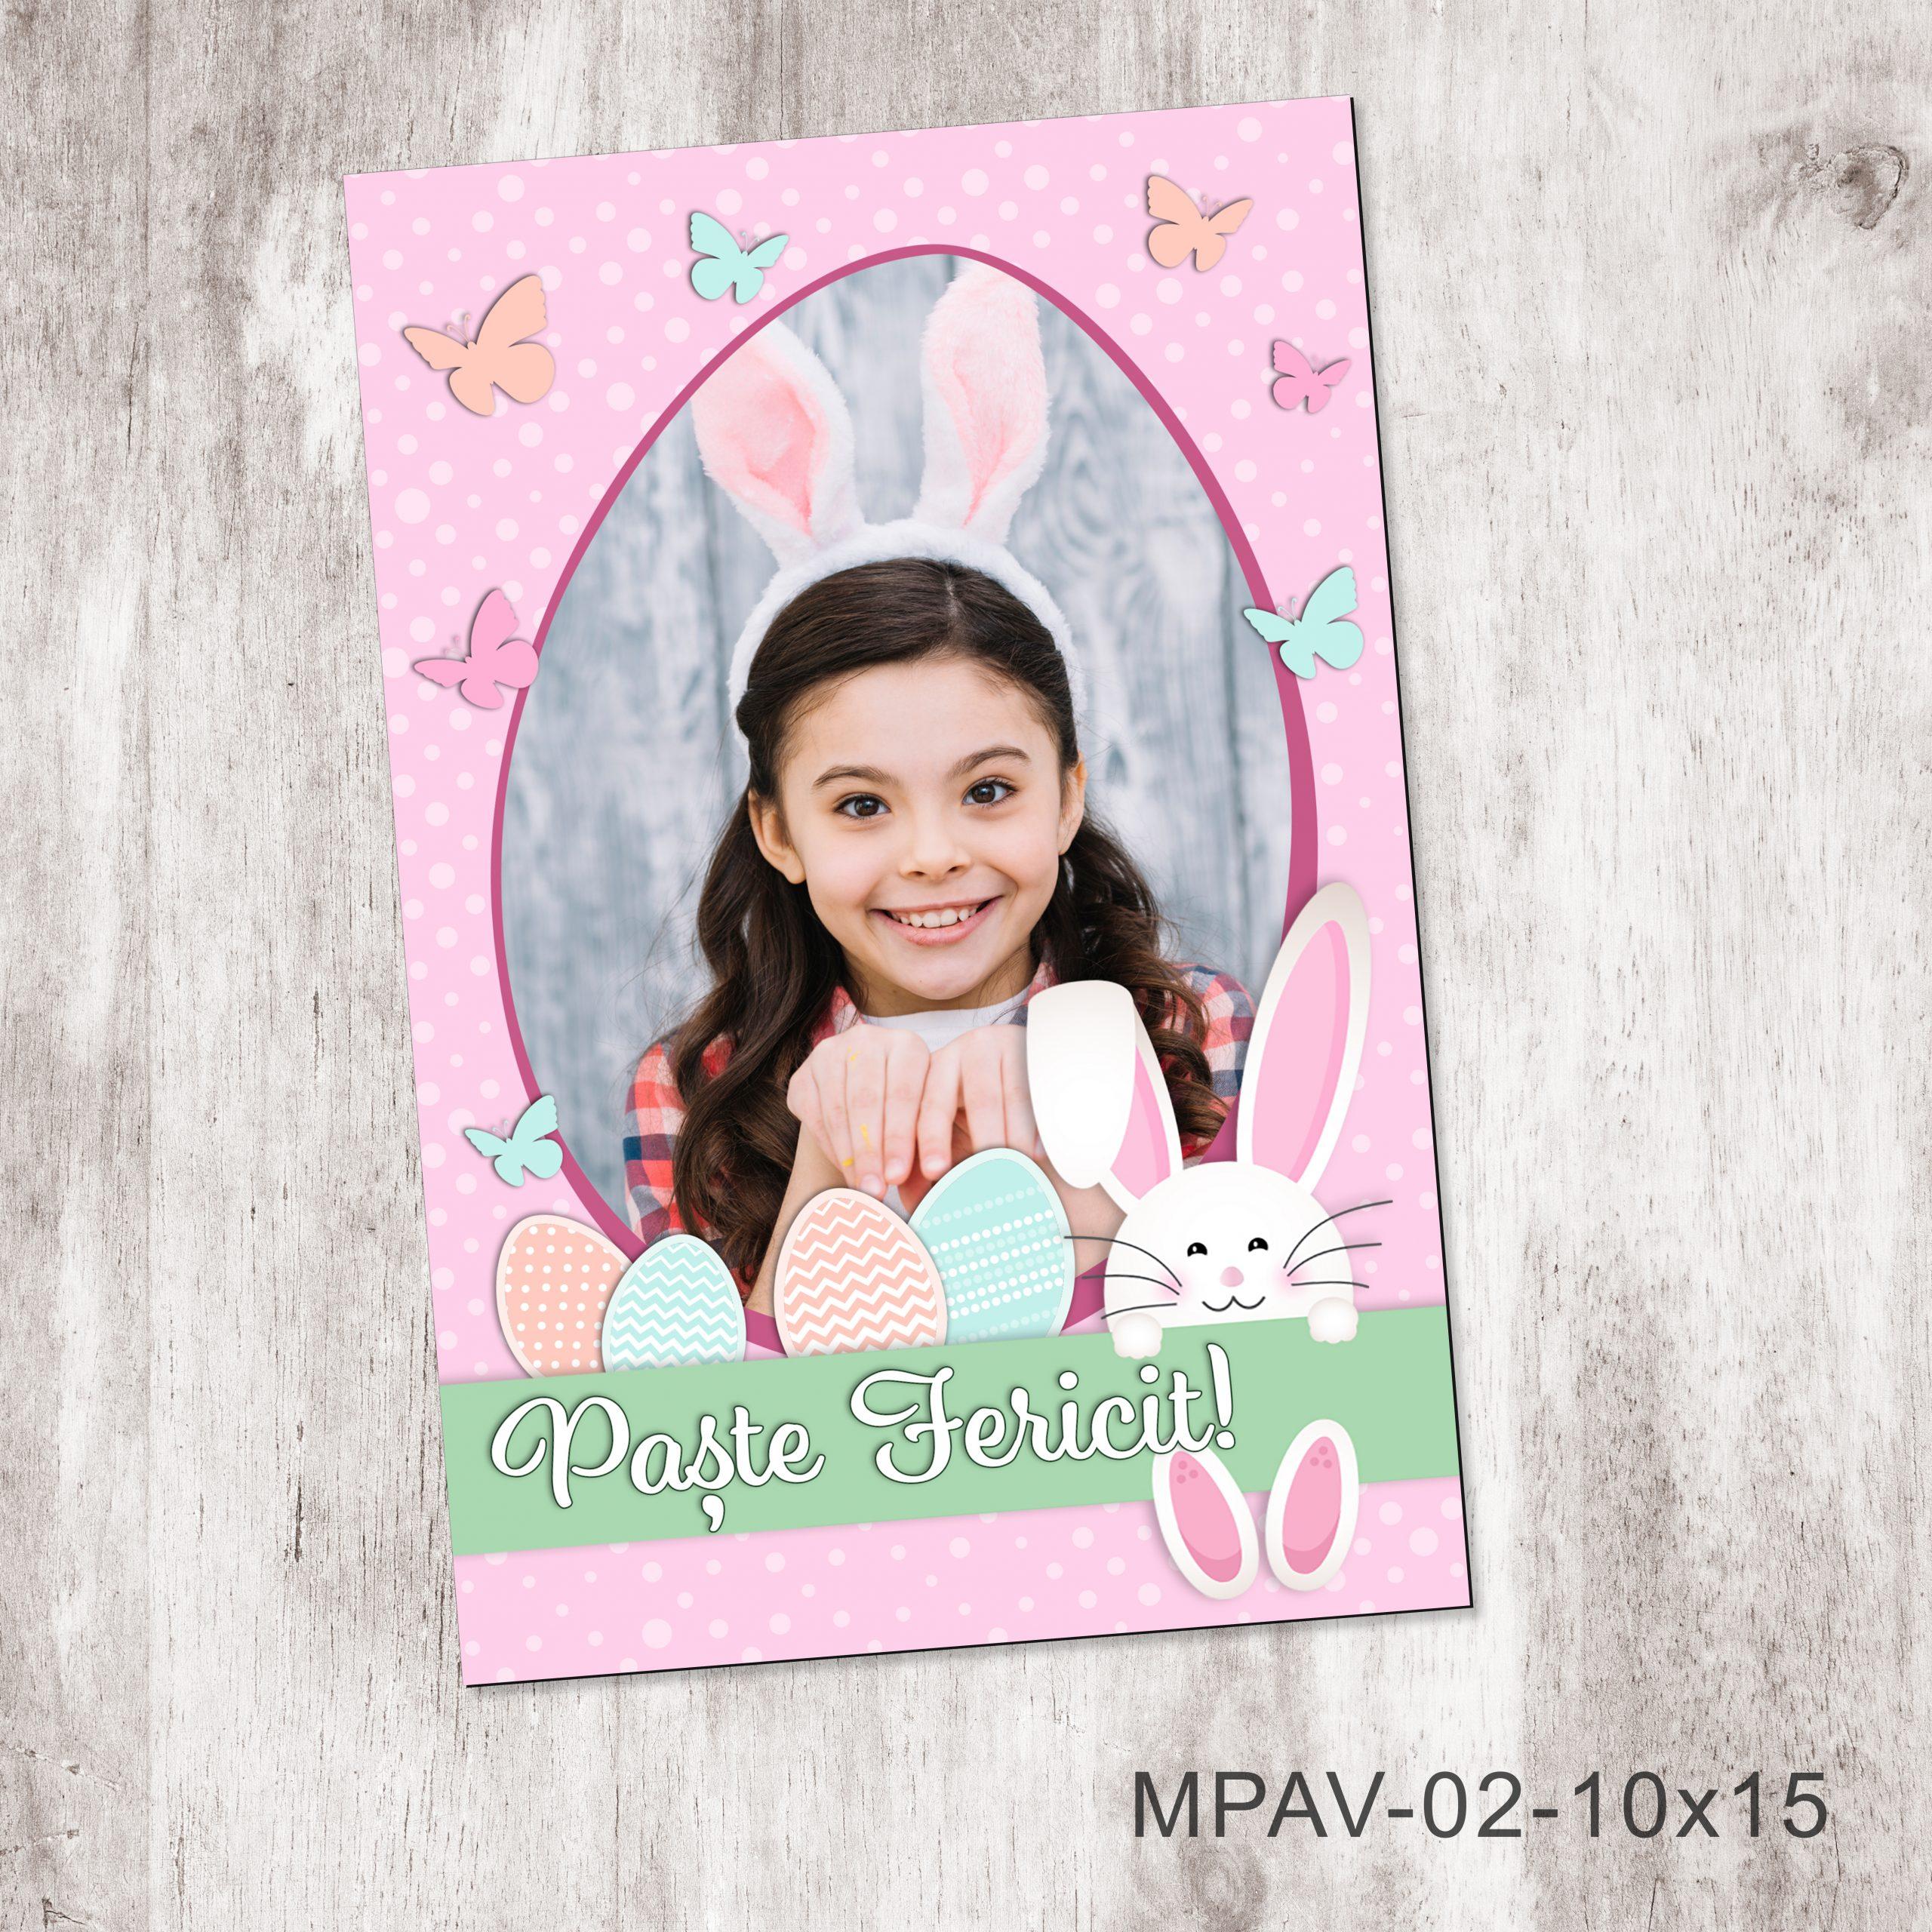 Magnet personalizat Paste MPAV-02-10X15